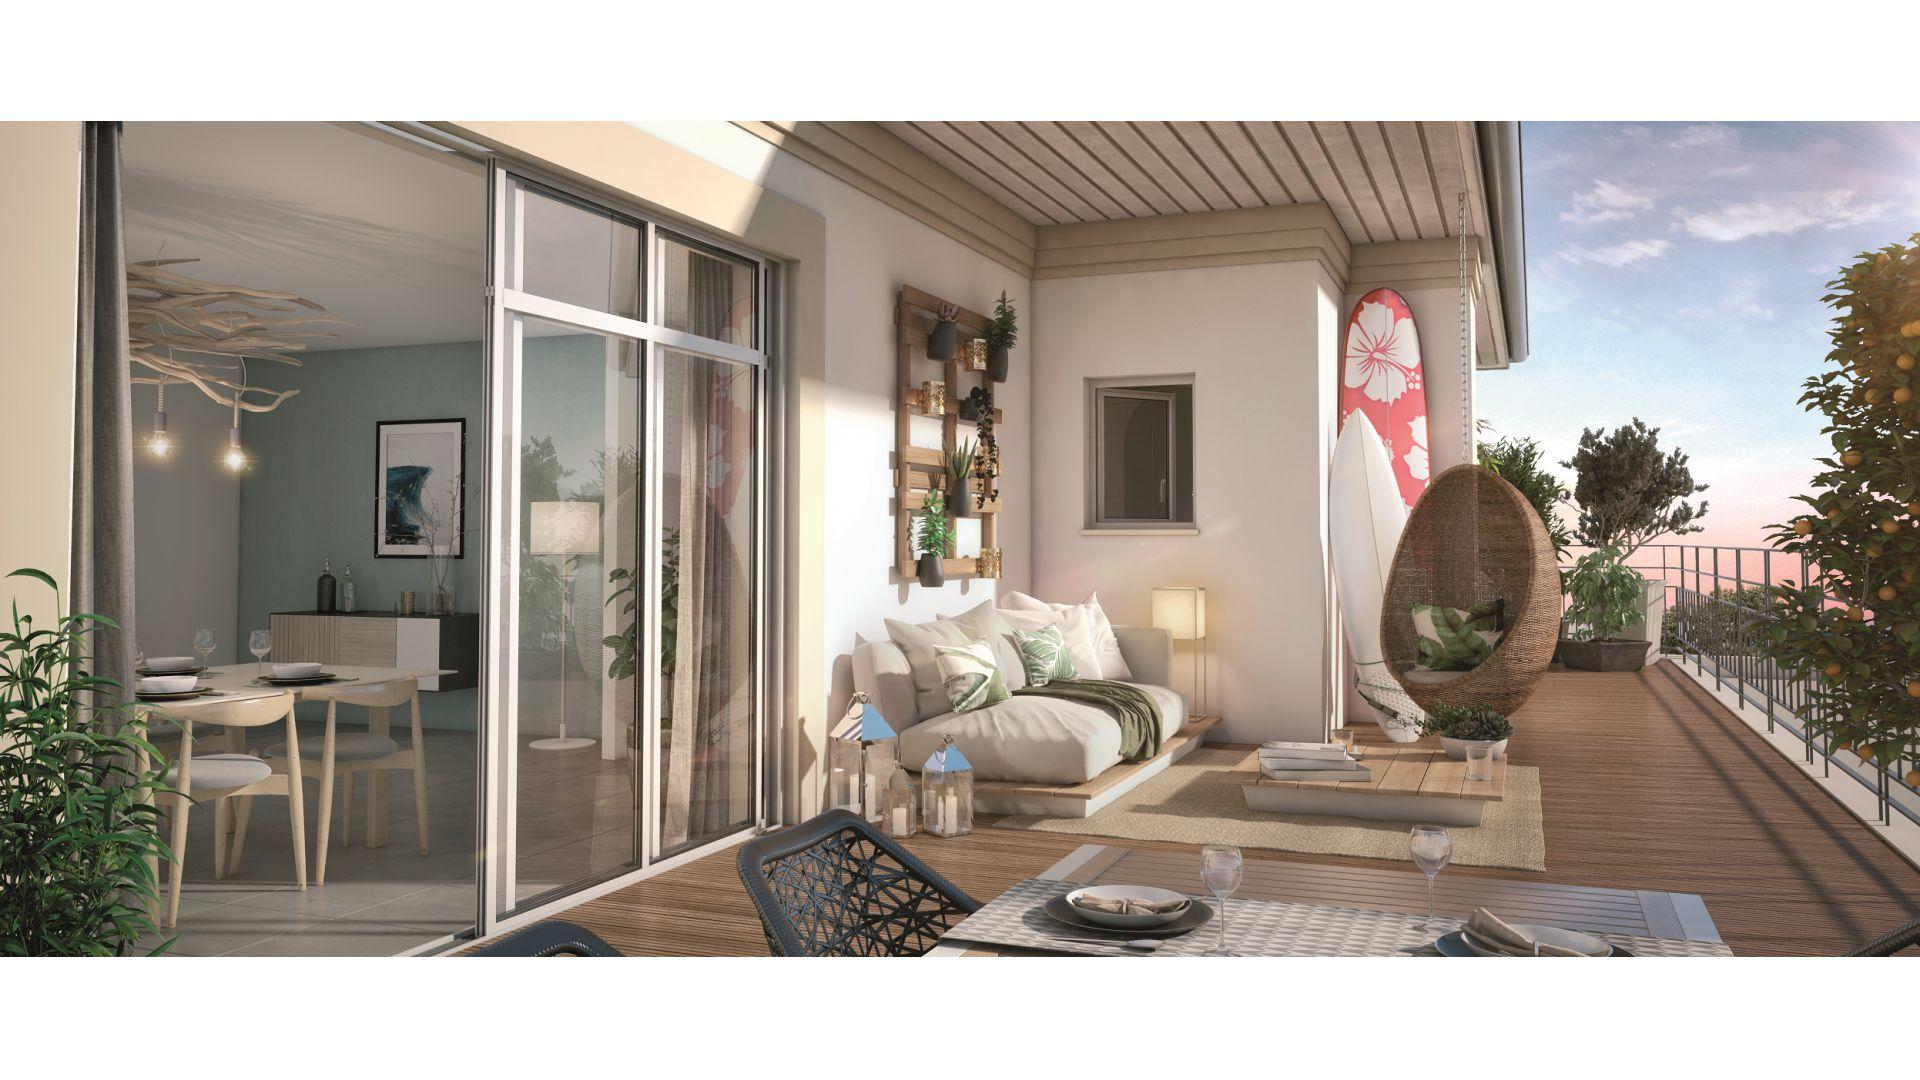 GreenCity immobilier - Biscarrosse - 40 600 - appartements du T1Bis au T4 - vue terrasse